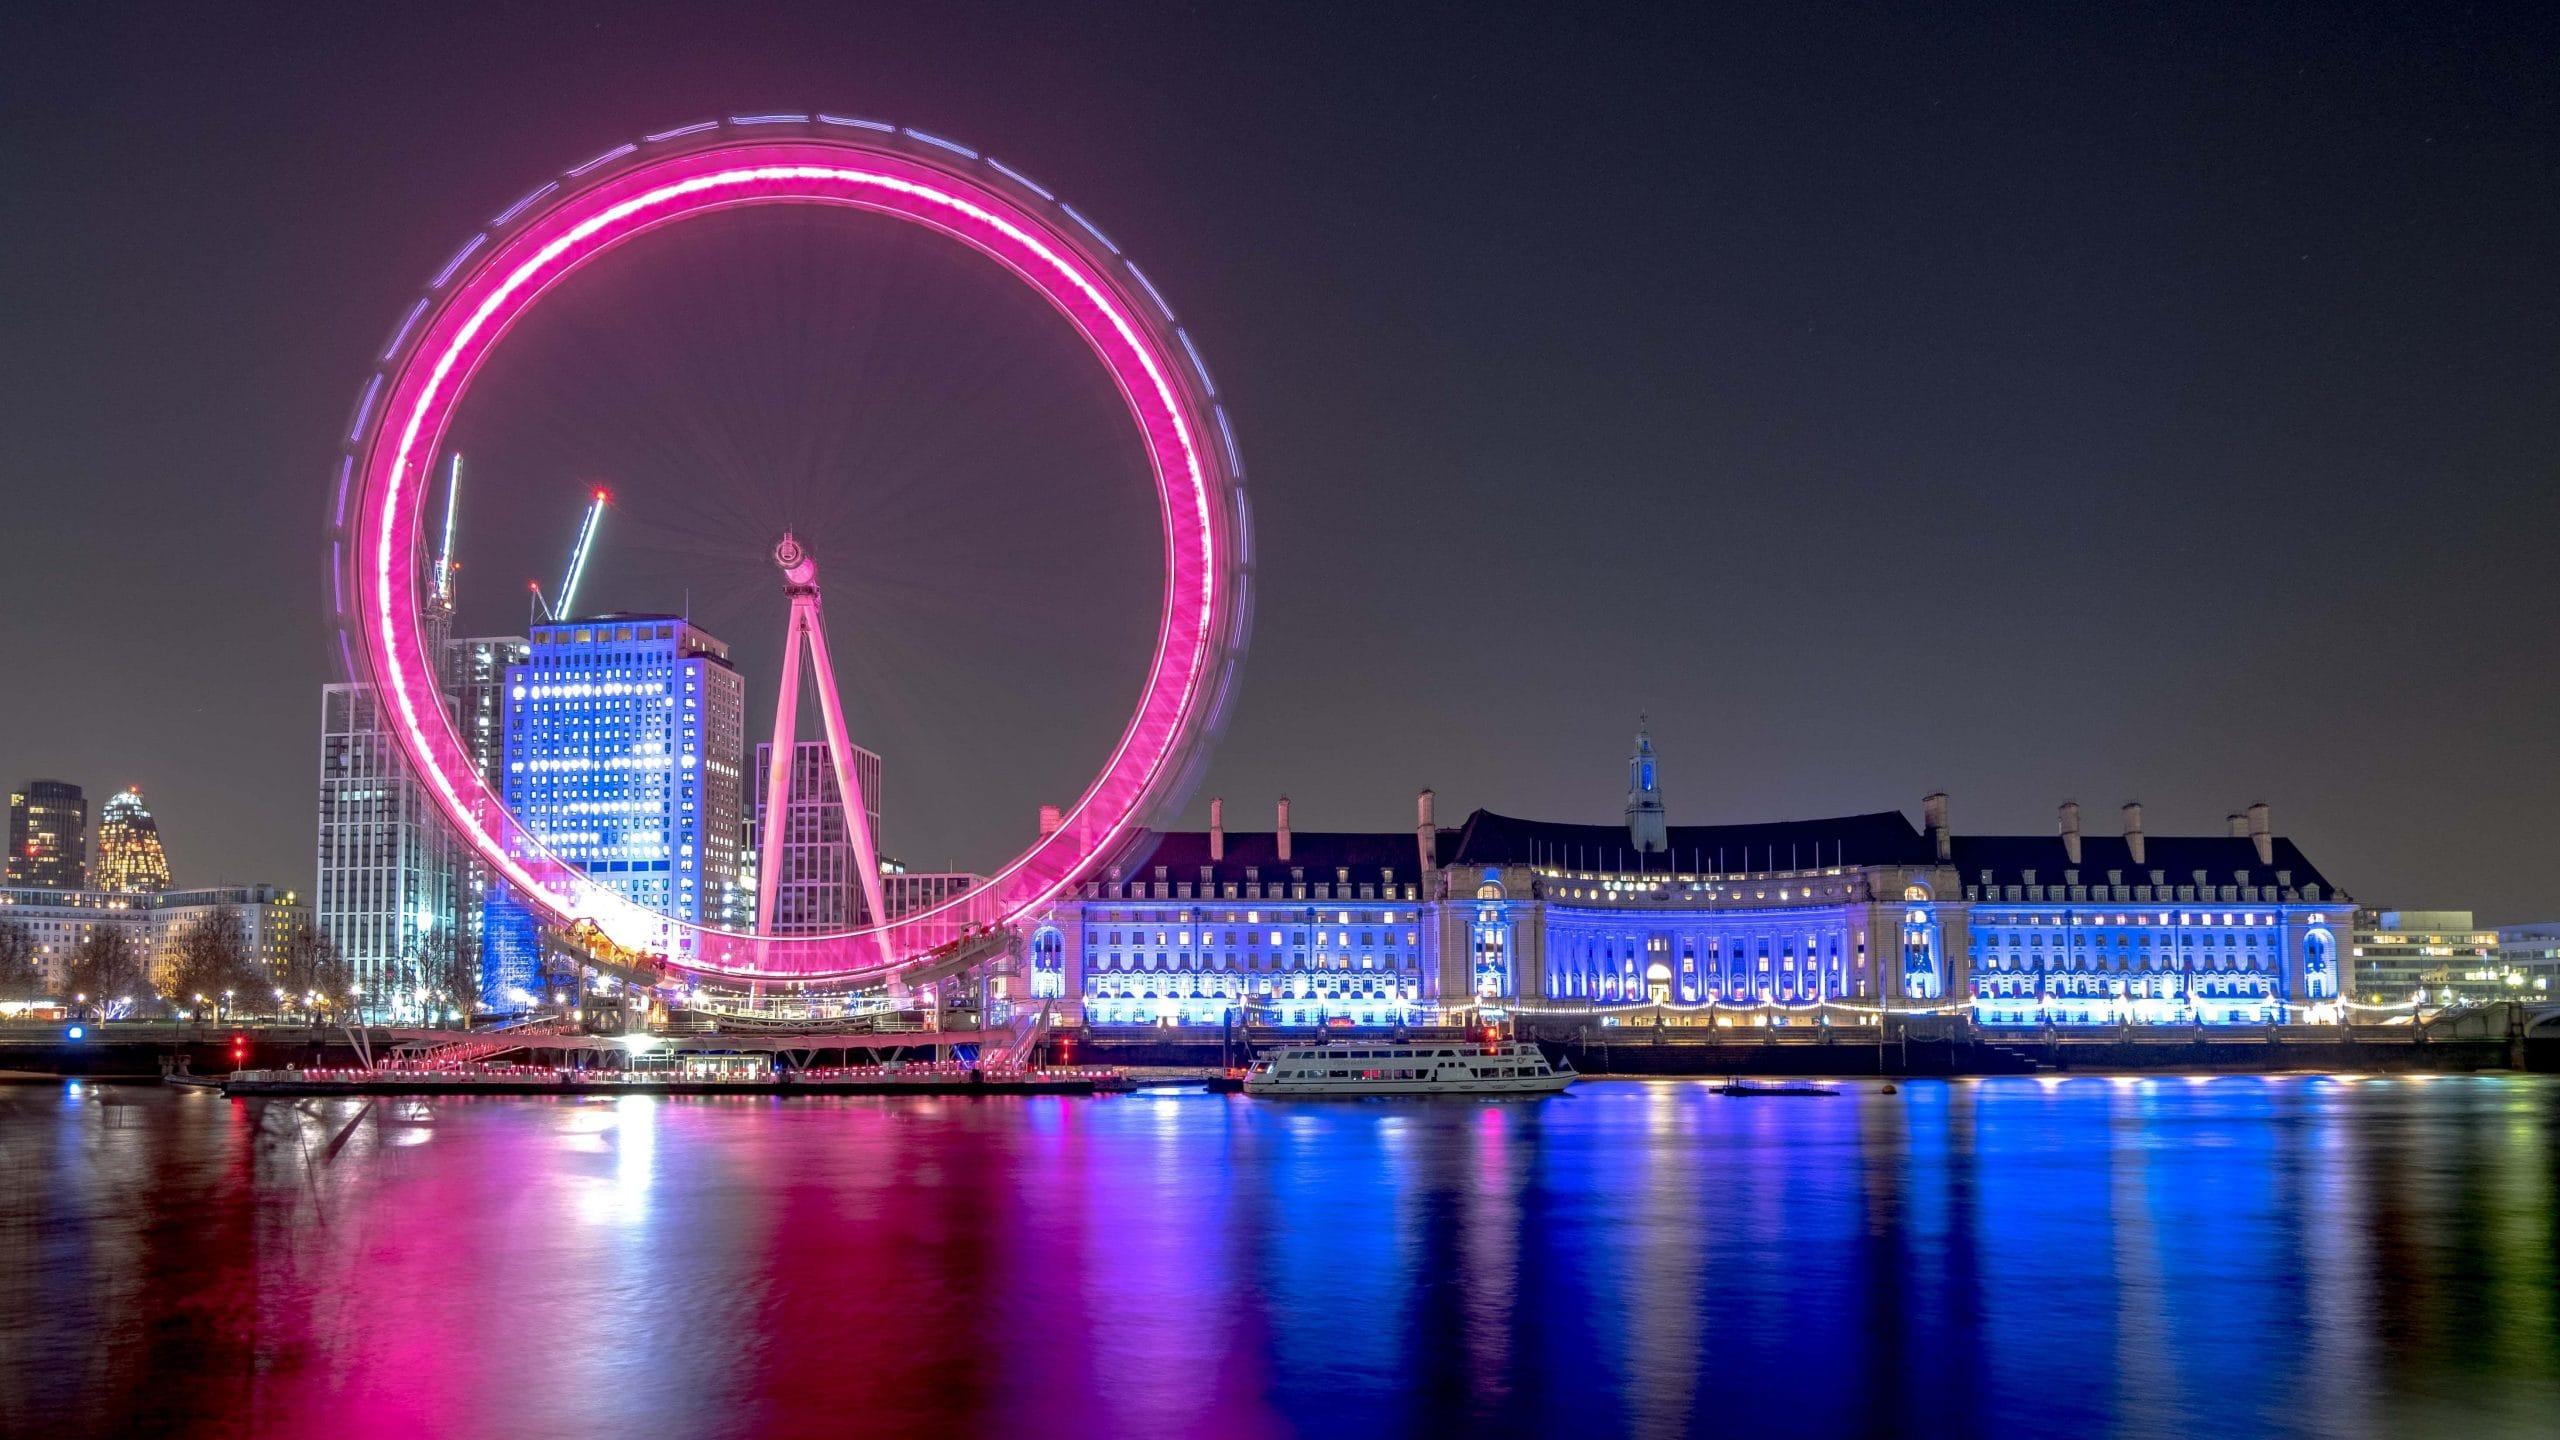 The London Eye Famous London Landmarks